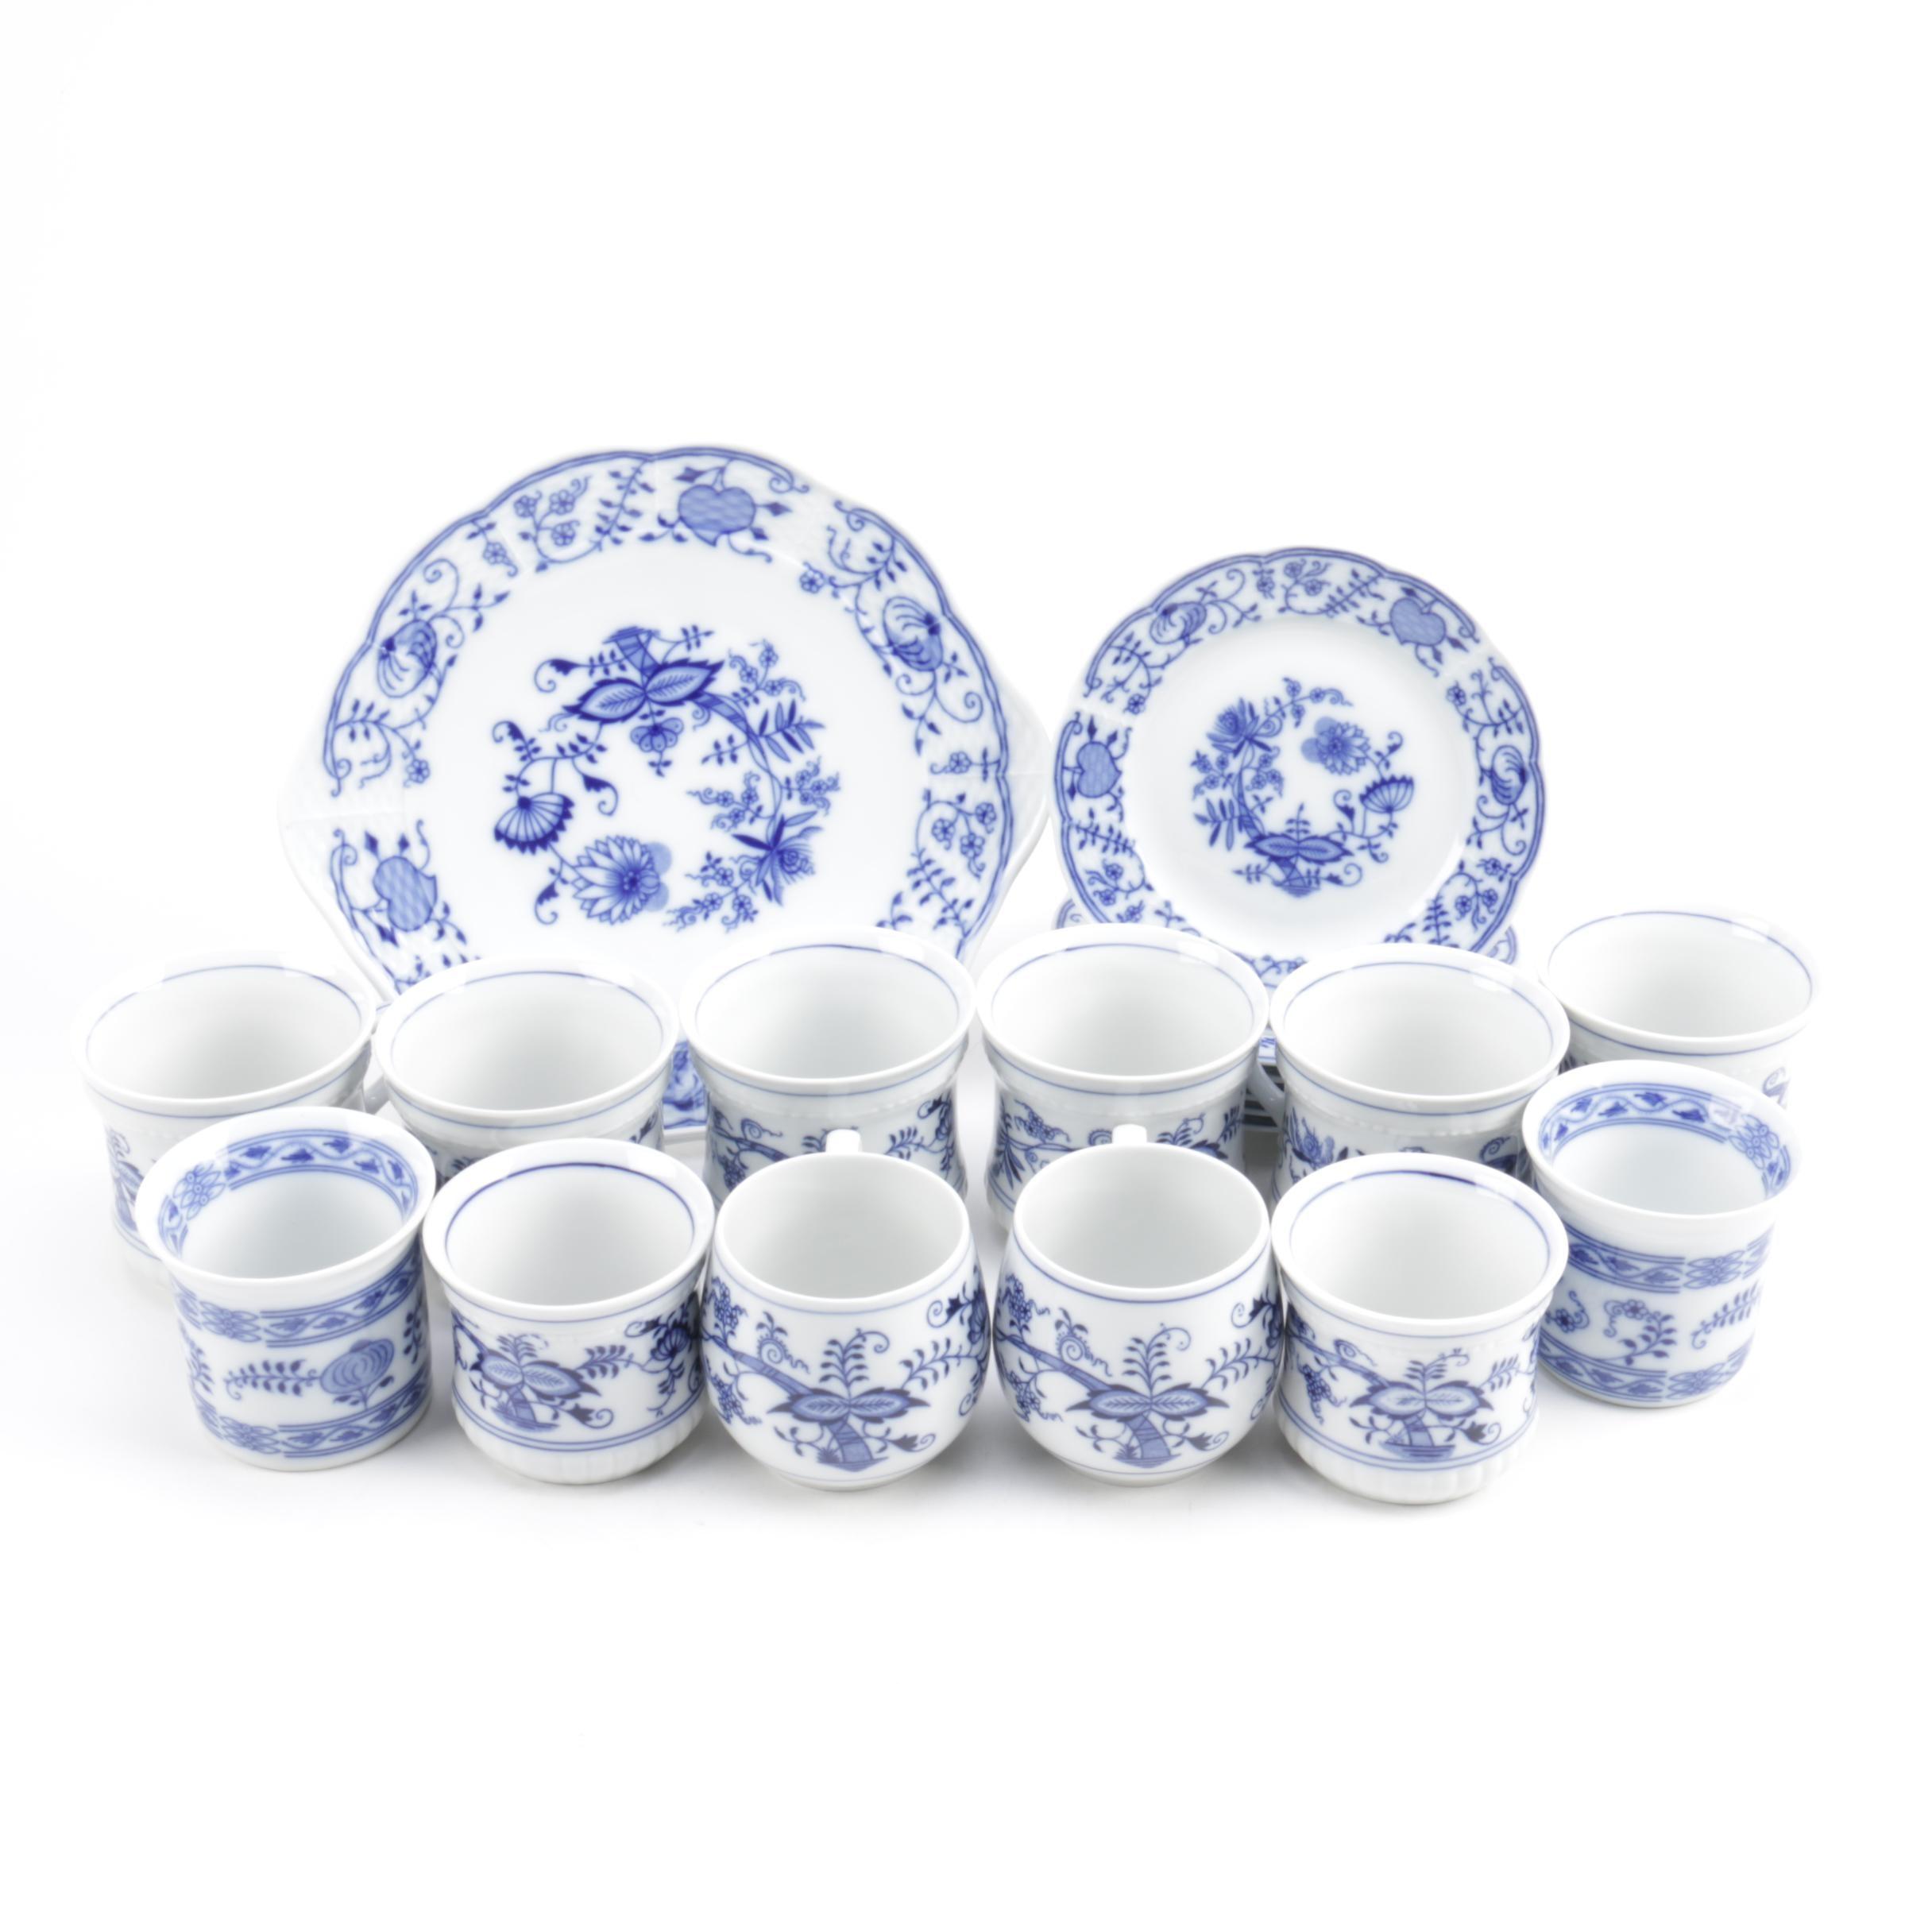 "Vintage Duchcov and Thun ""Blue Onion"" Porcelain Tableware"